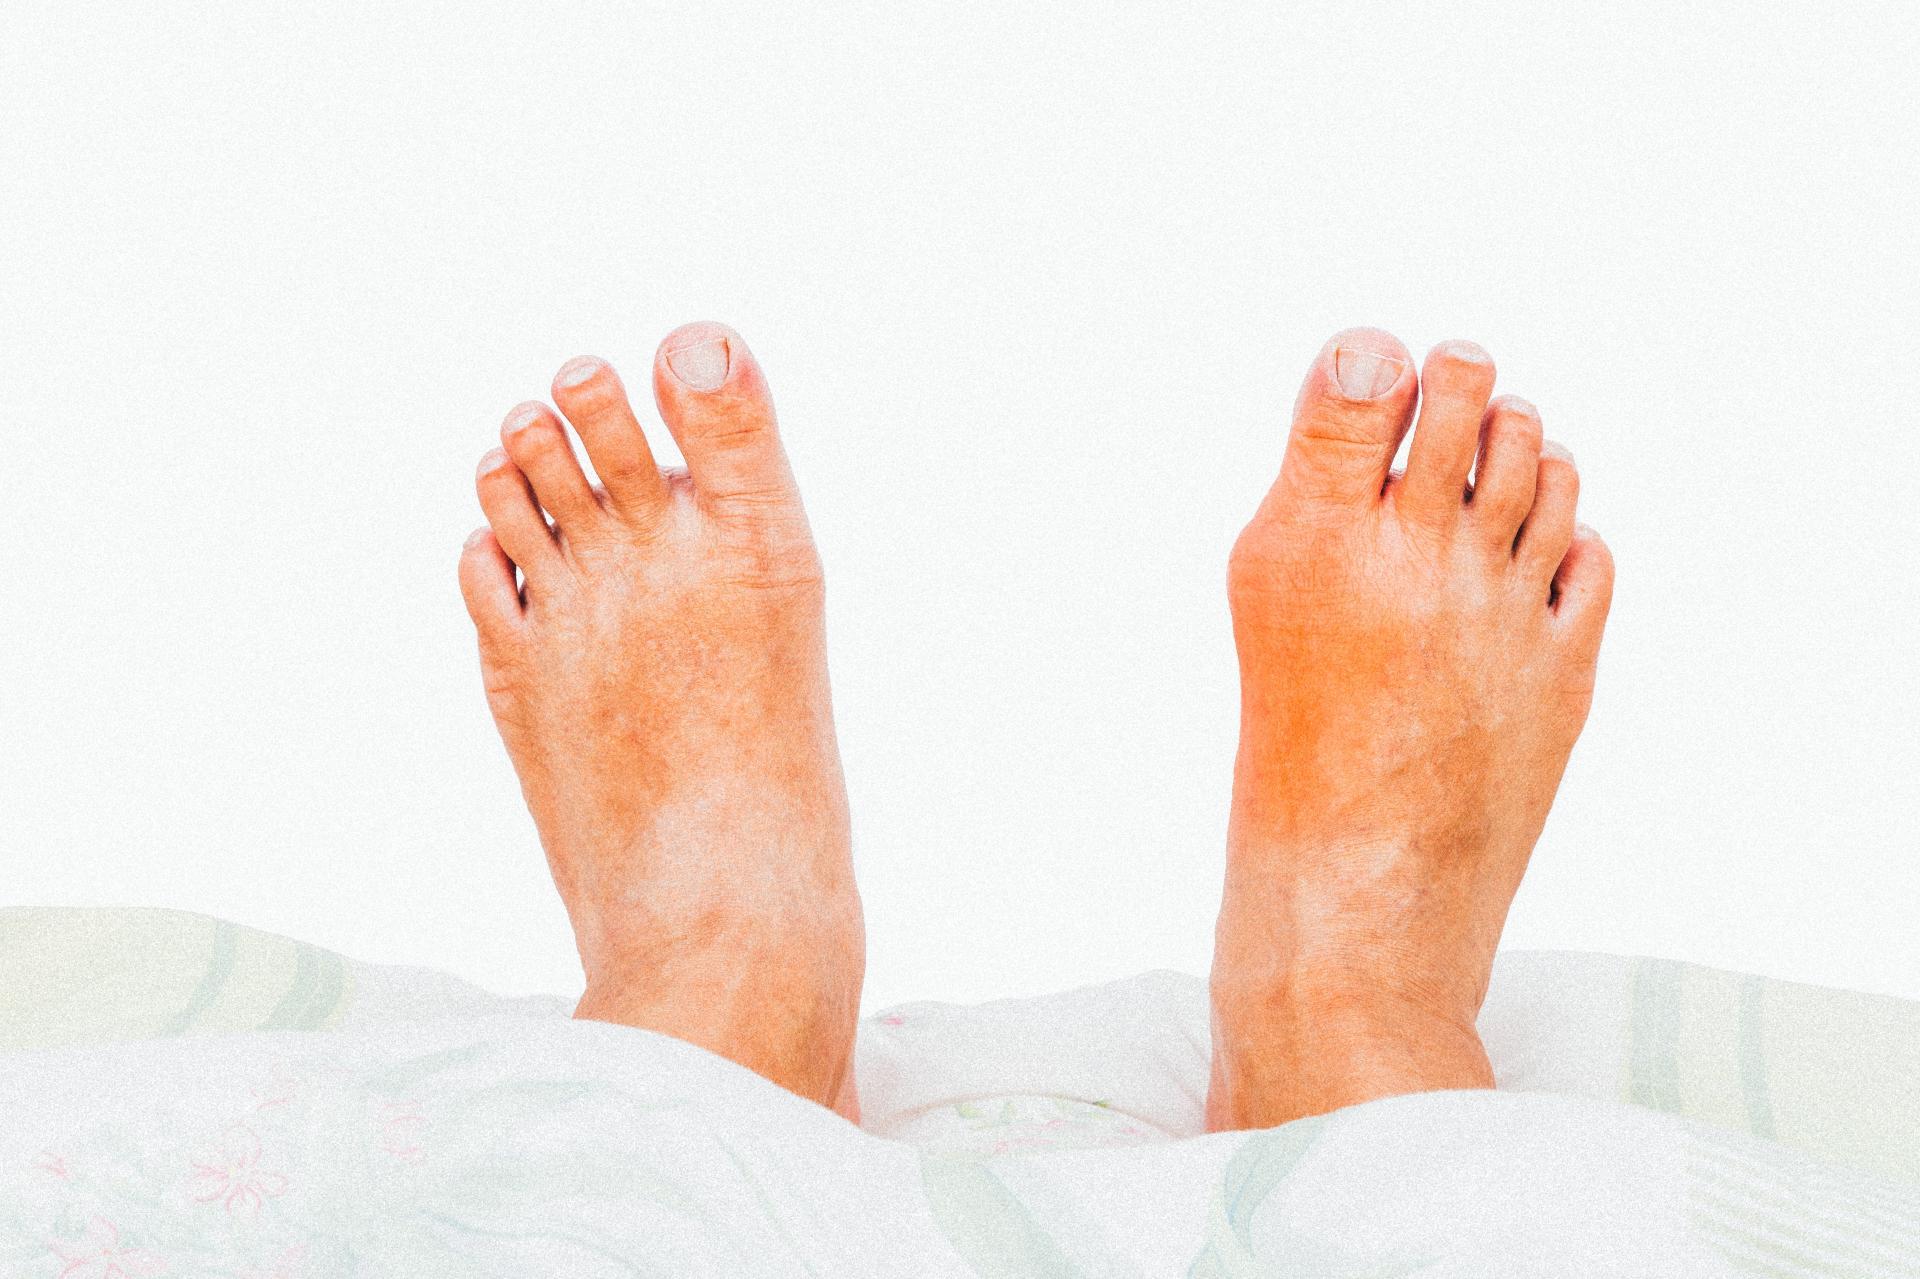 pés inchados depois de beber cerveja